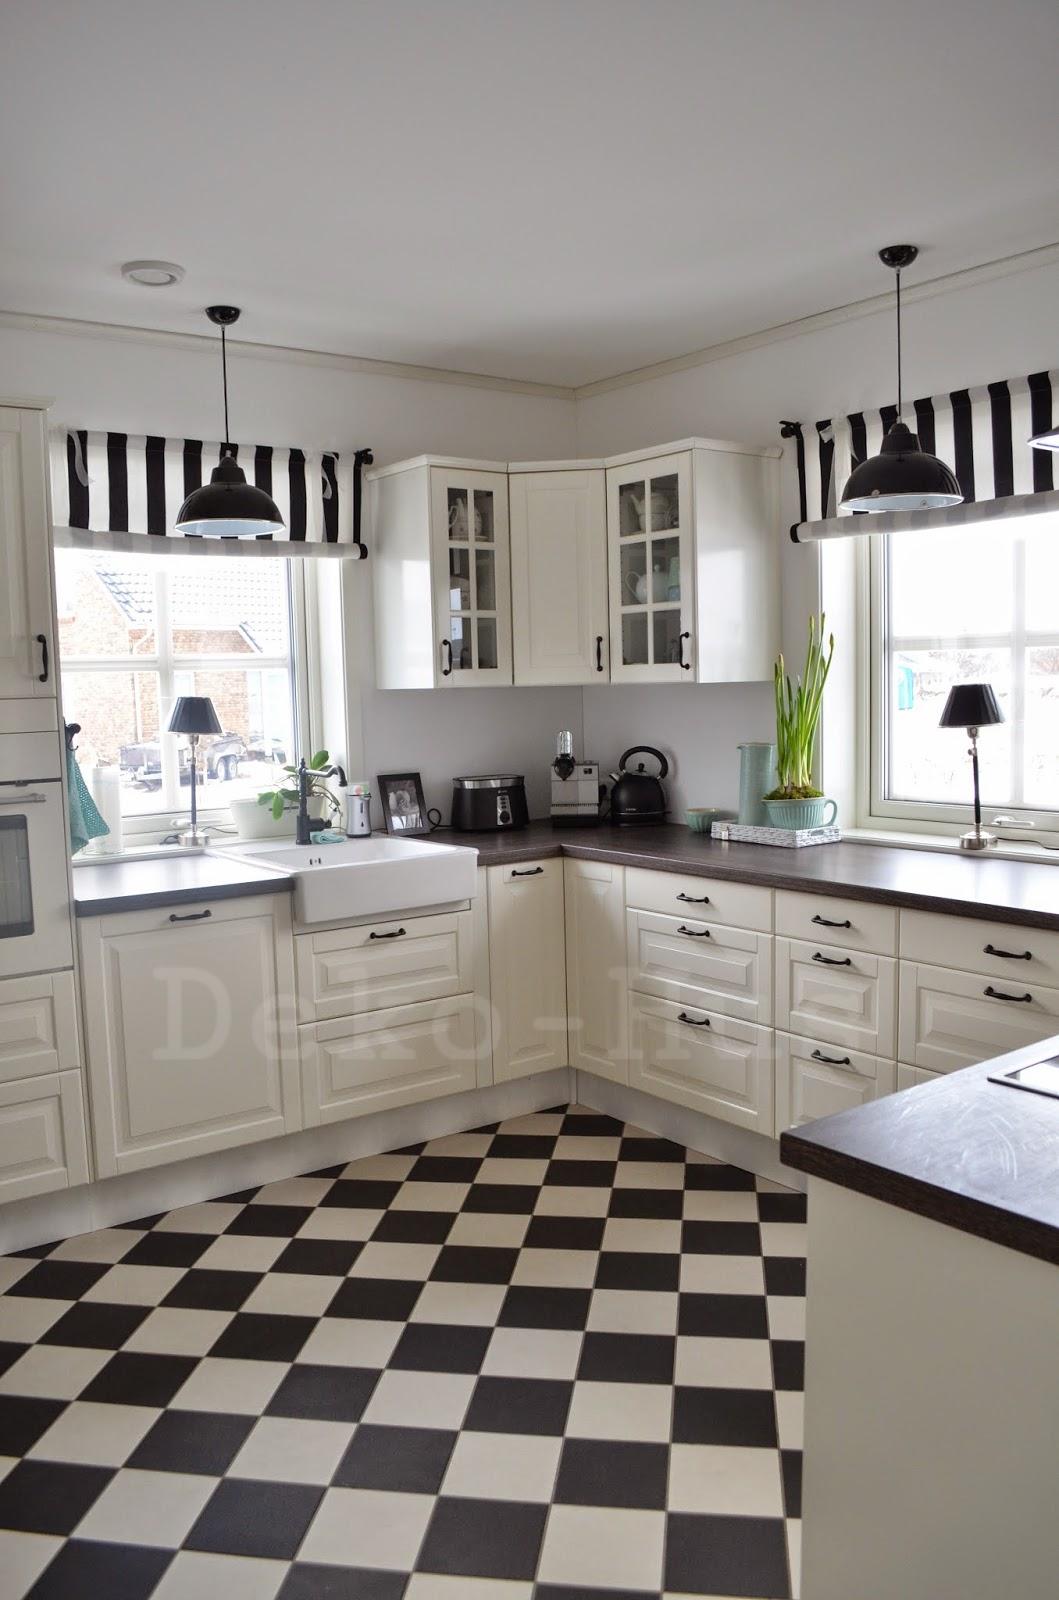 Beste Grau Küchenboden Fotos - Küche Set Ideen - deriherusweets.info